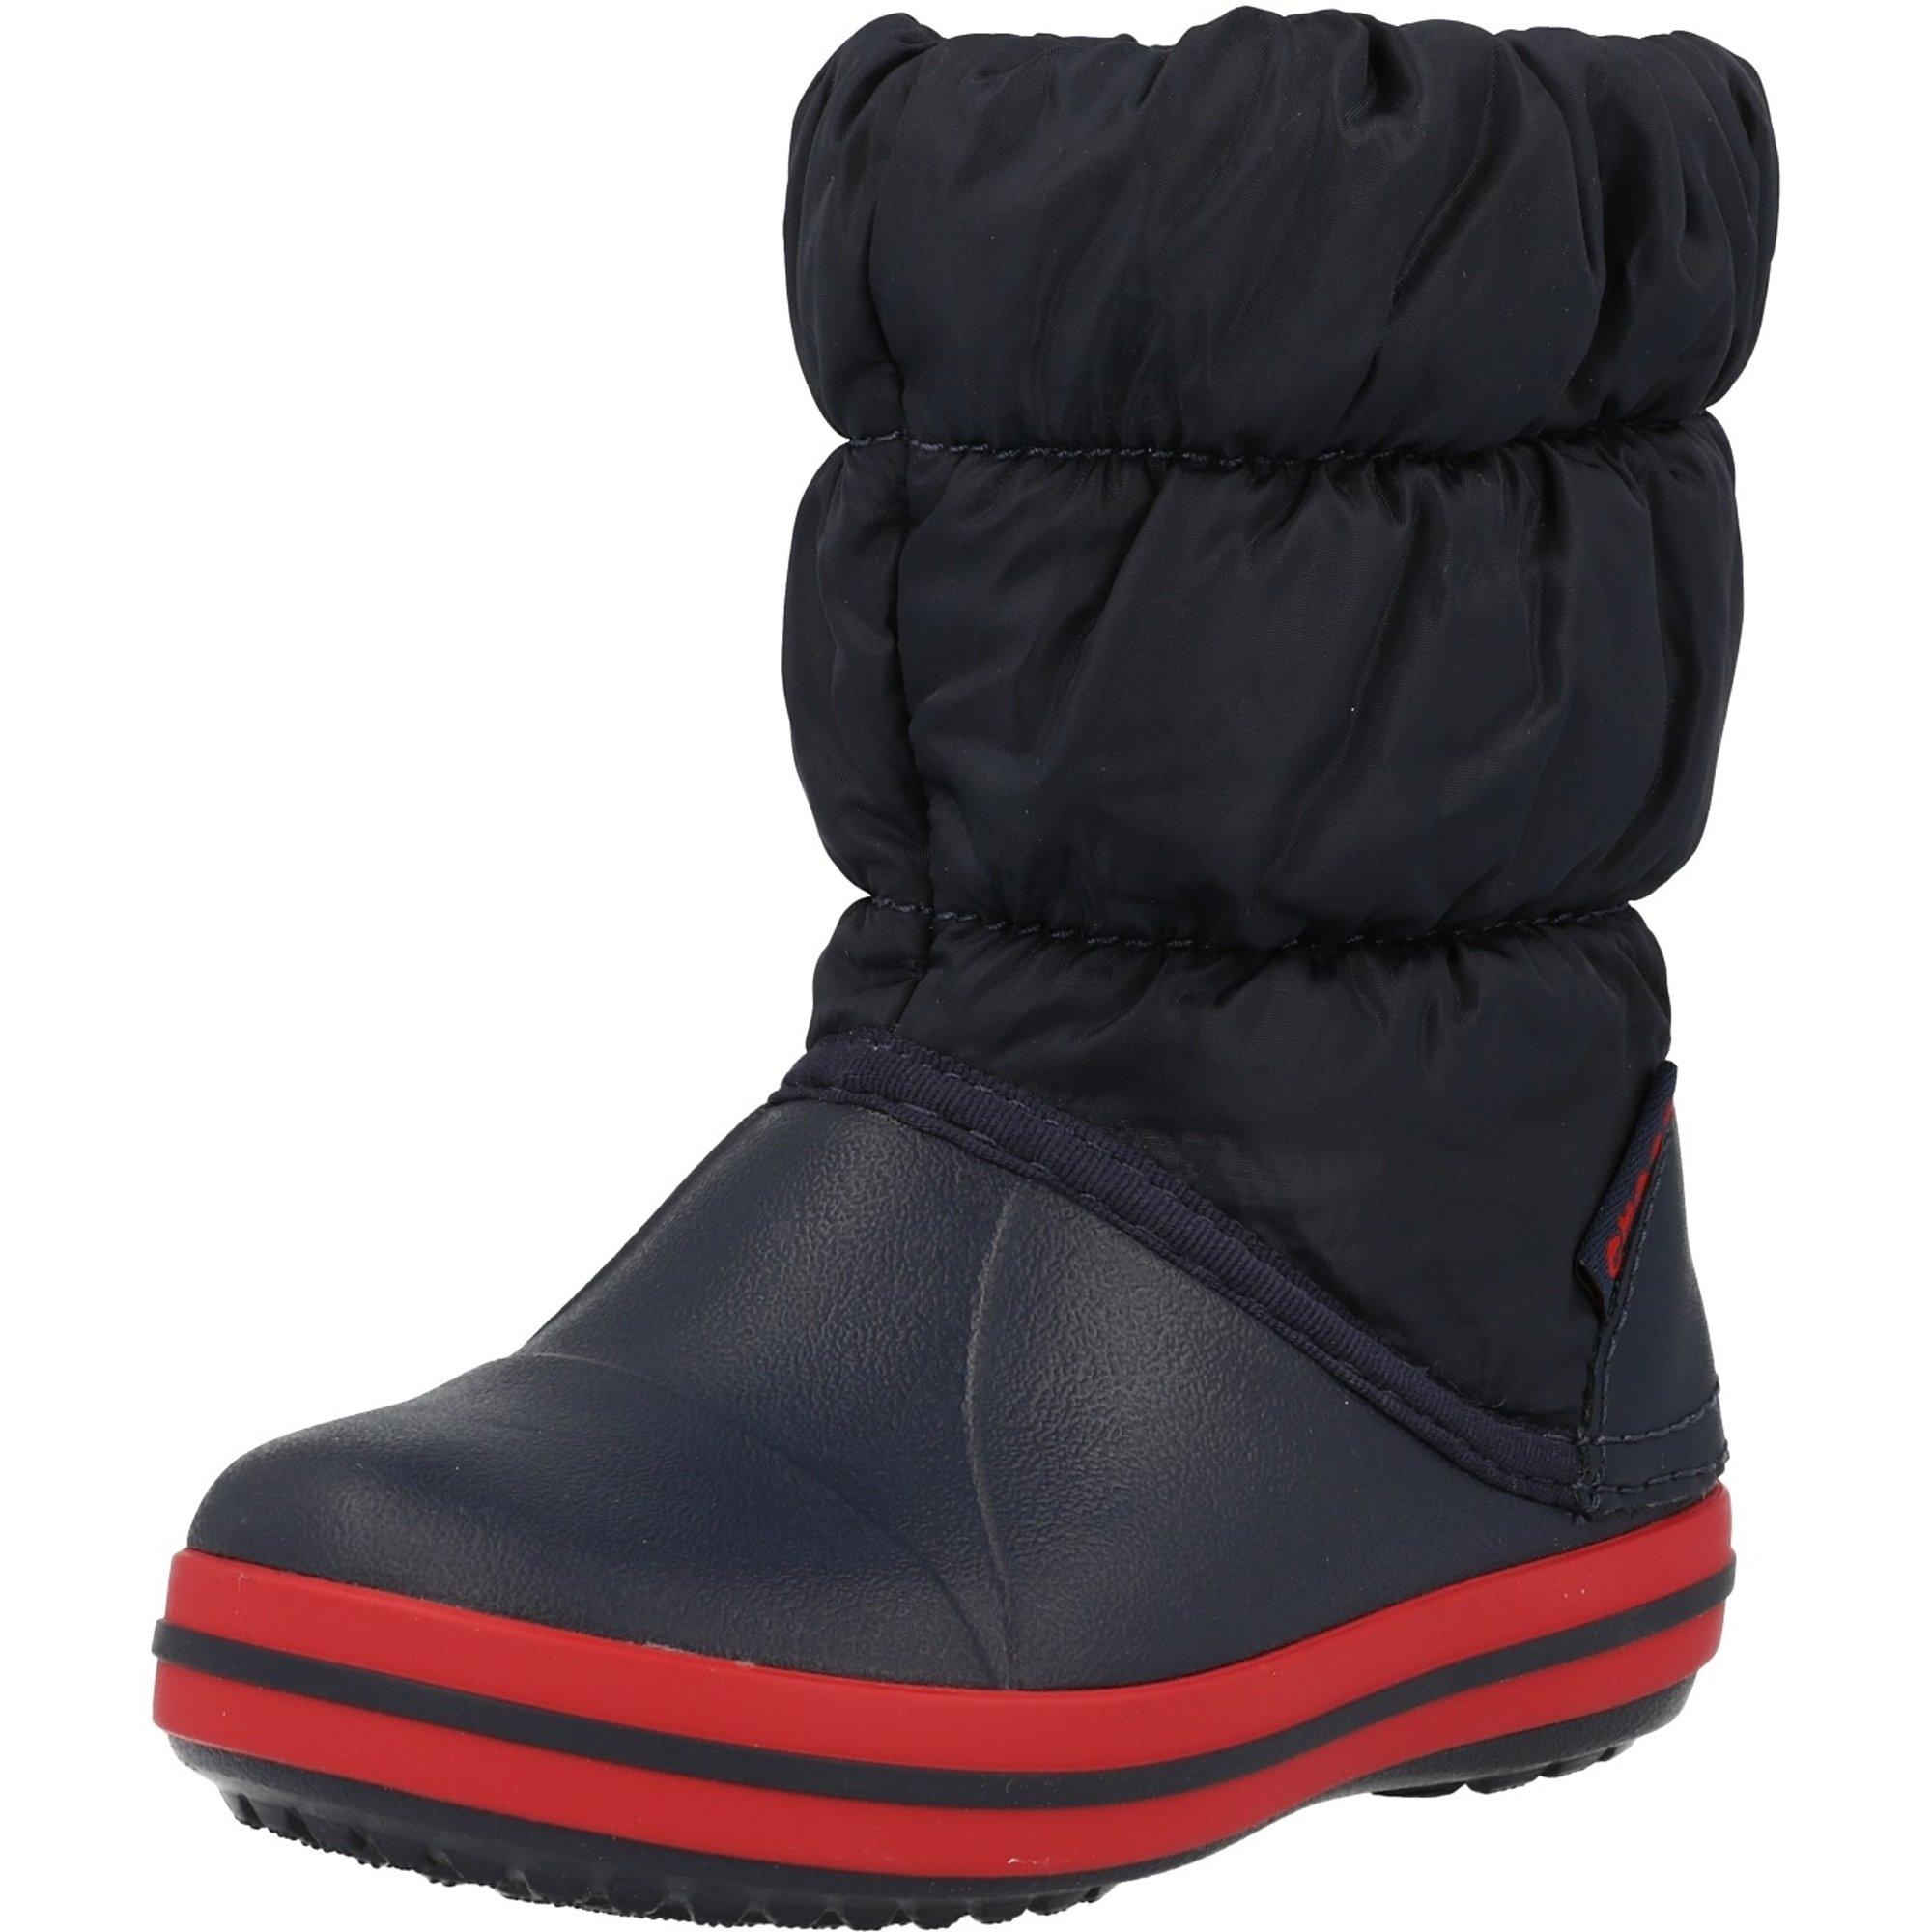 Crocs Kids Winter Puff Boot Navy/Red Nylon Infant